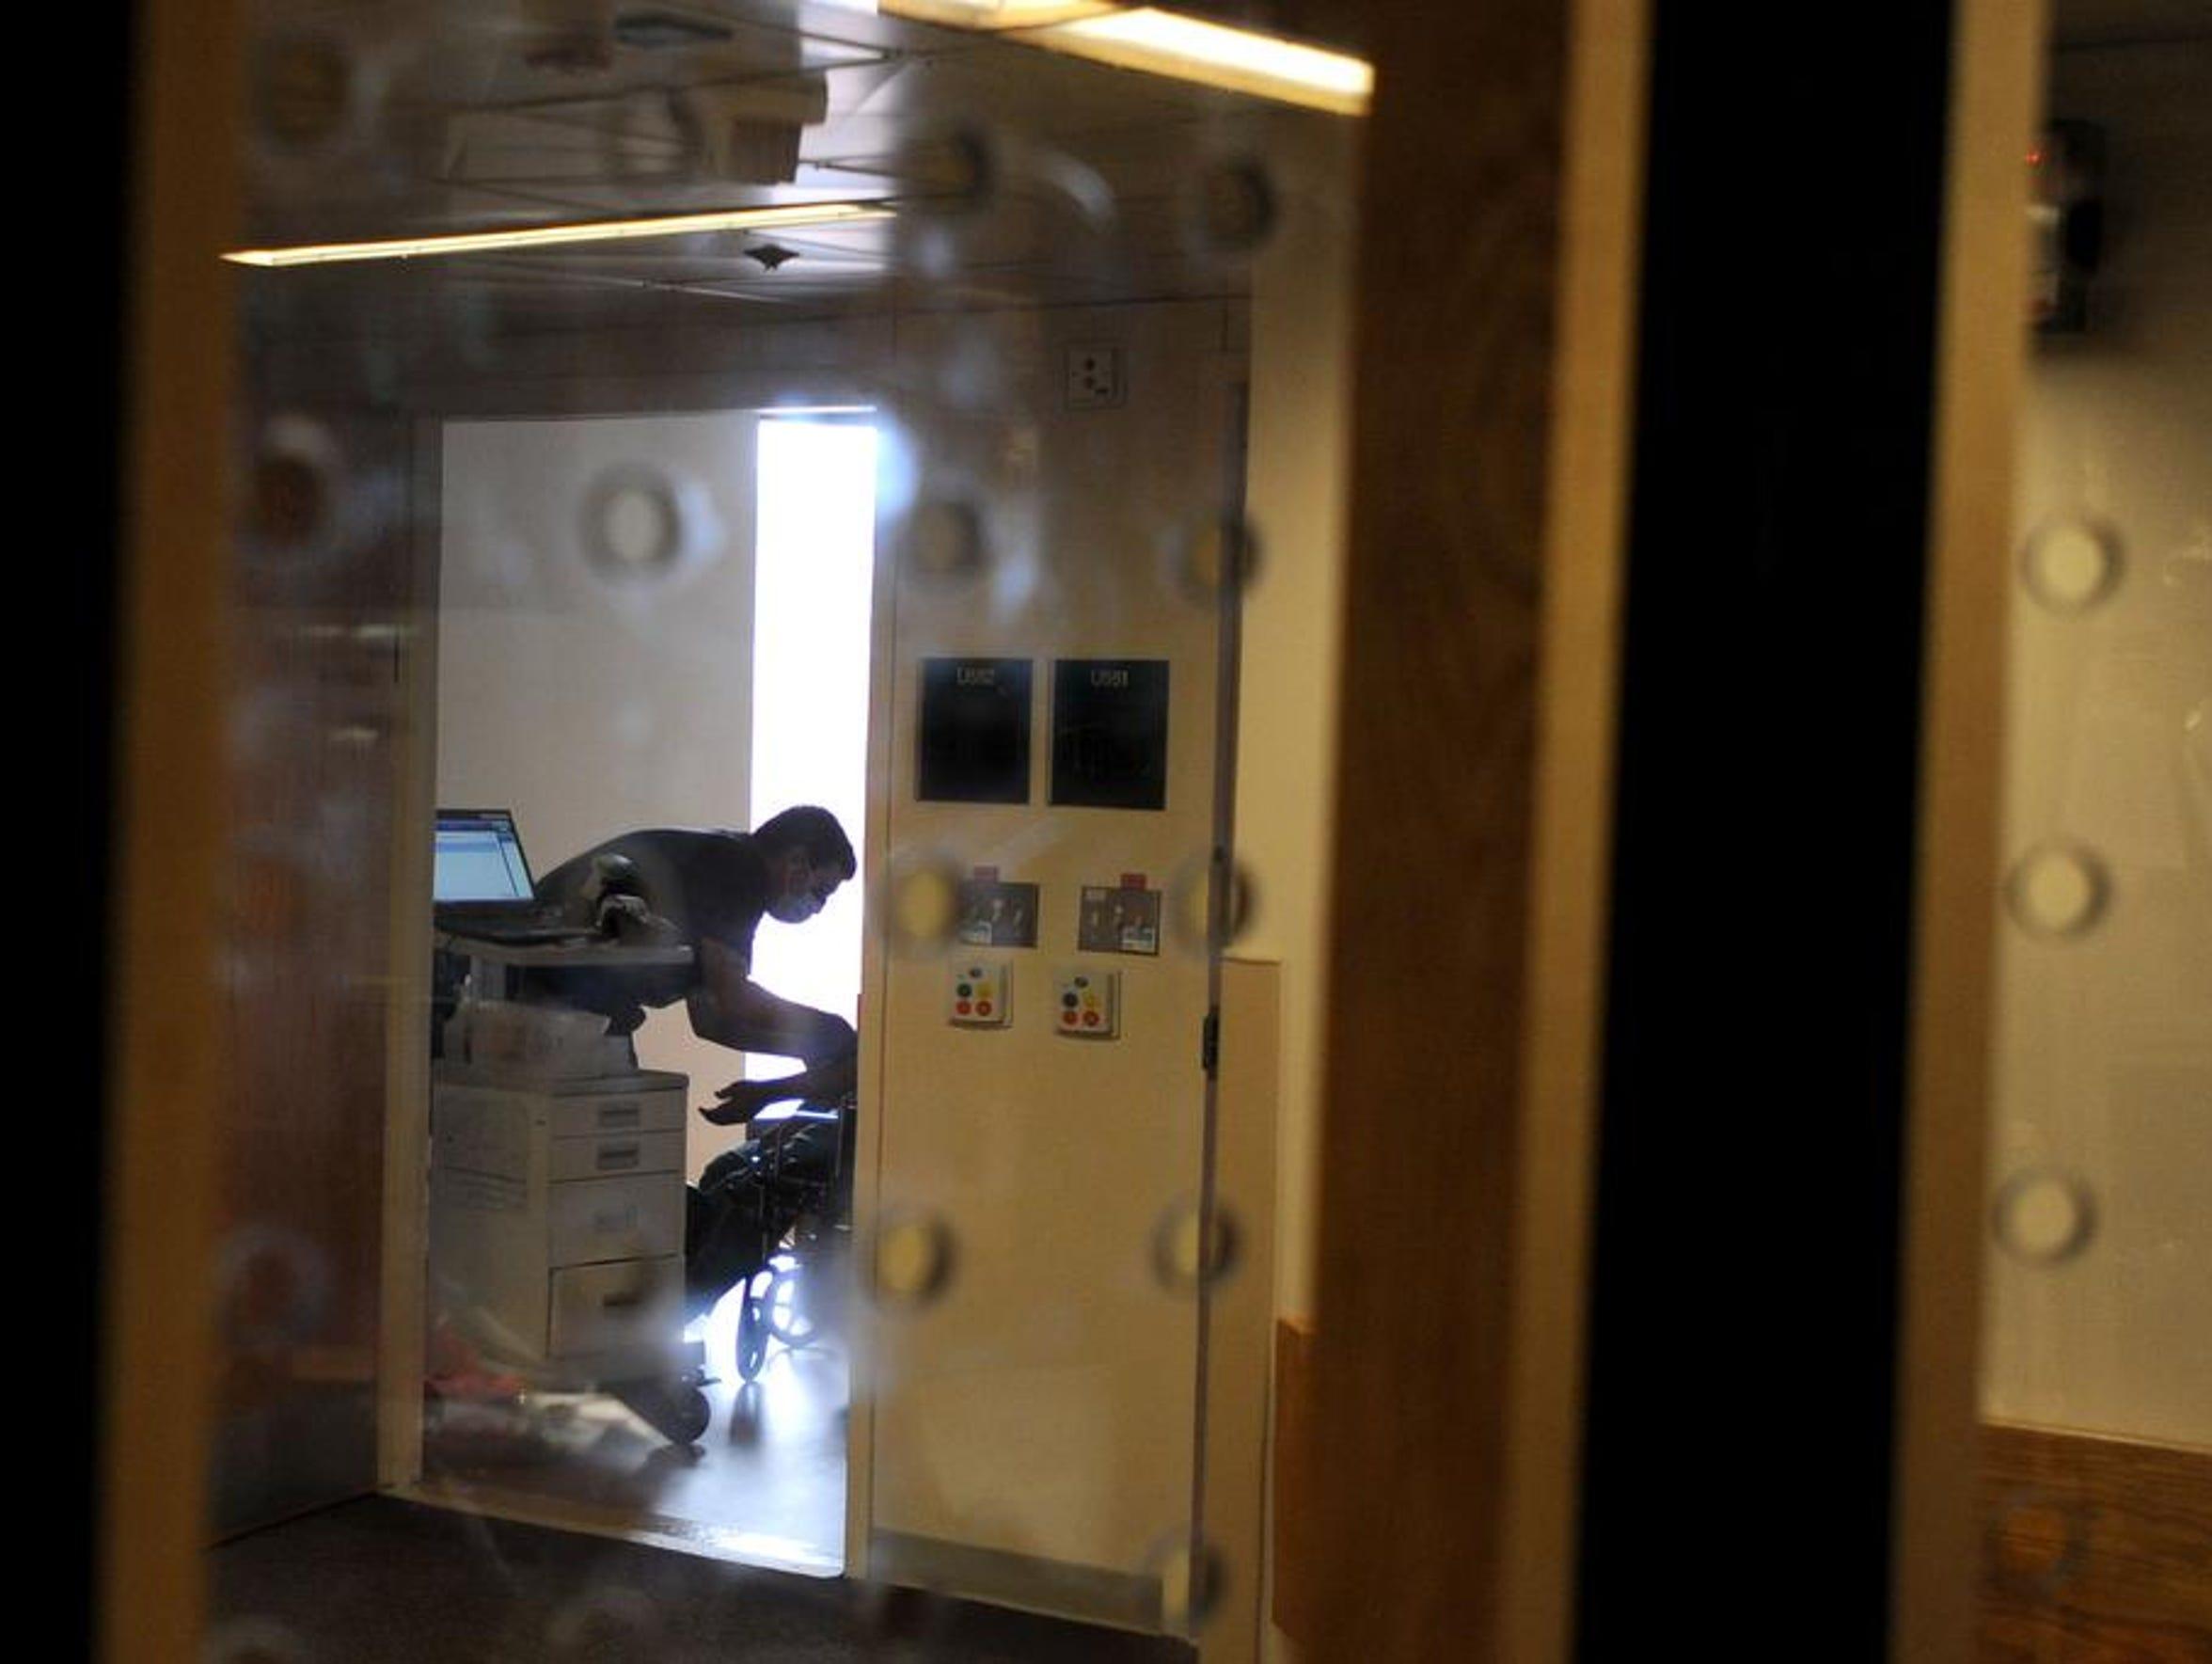 Seem through protective glass, a medical technician